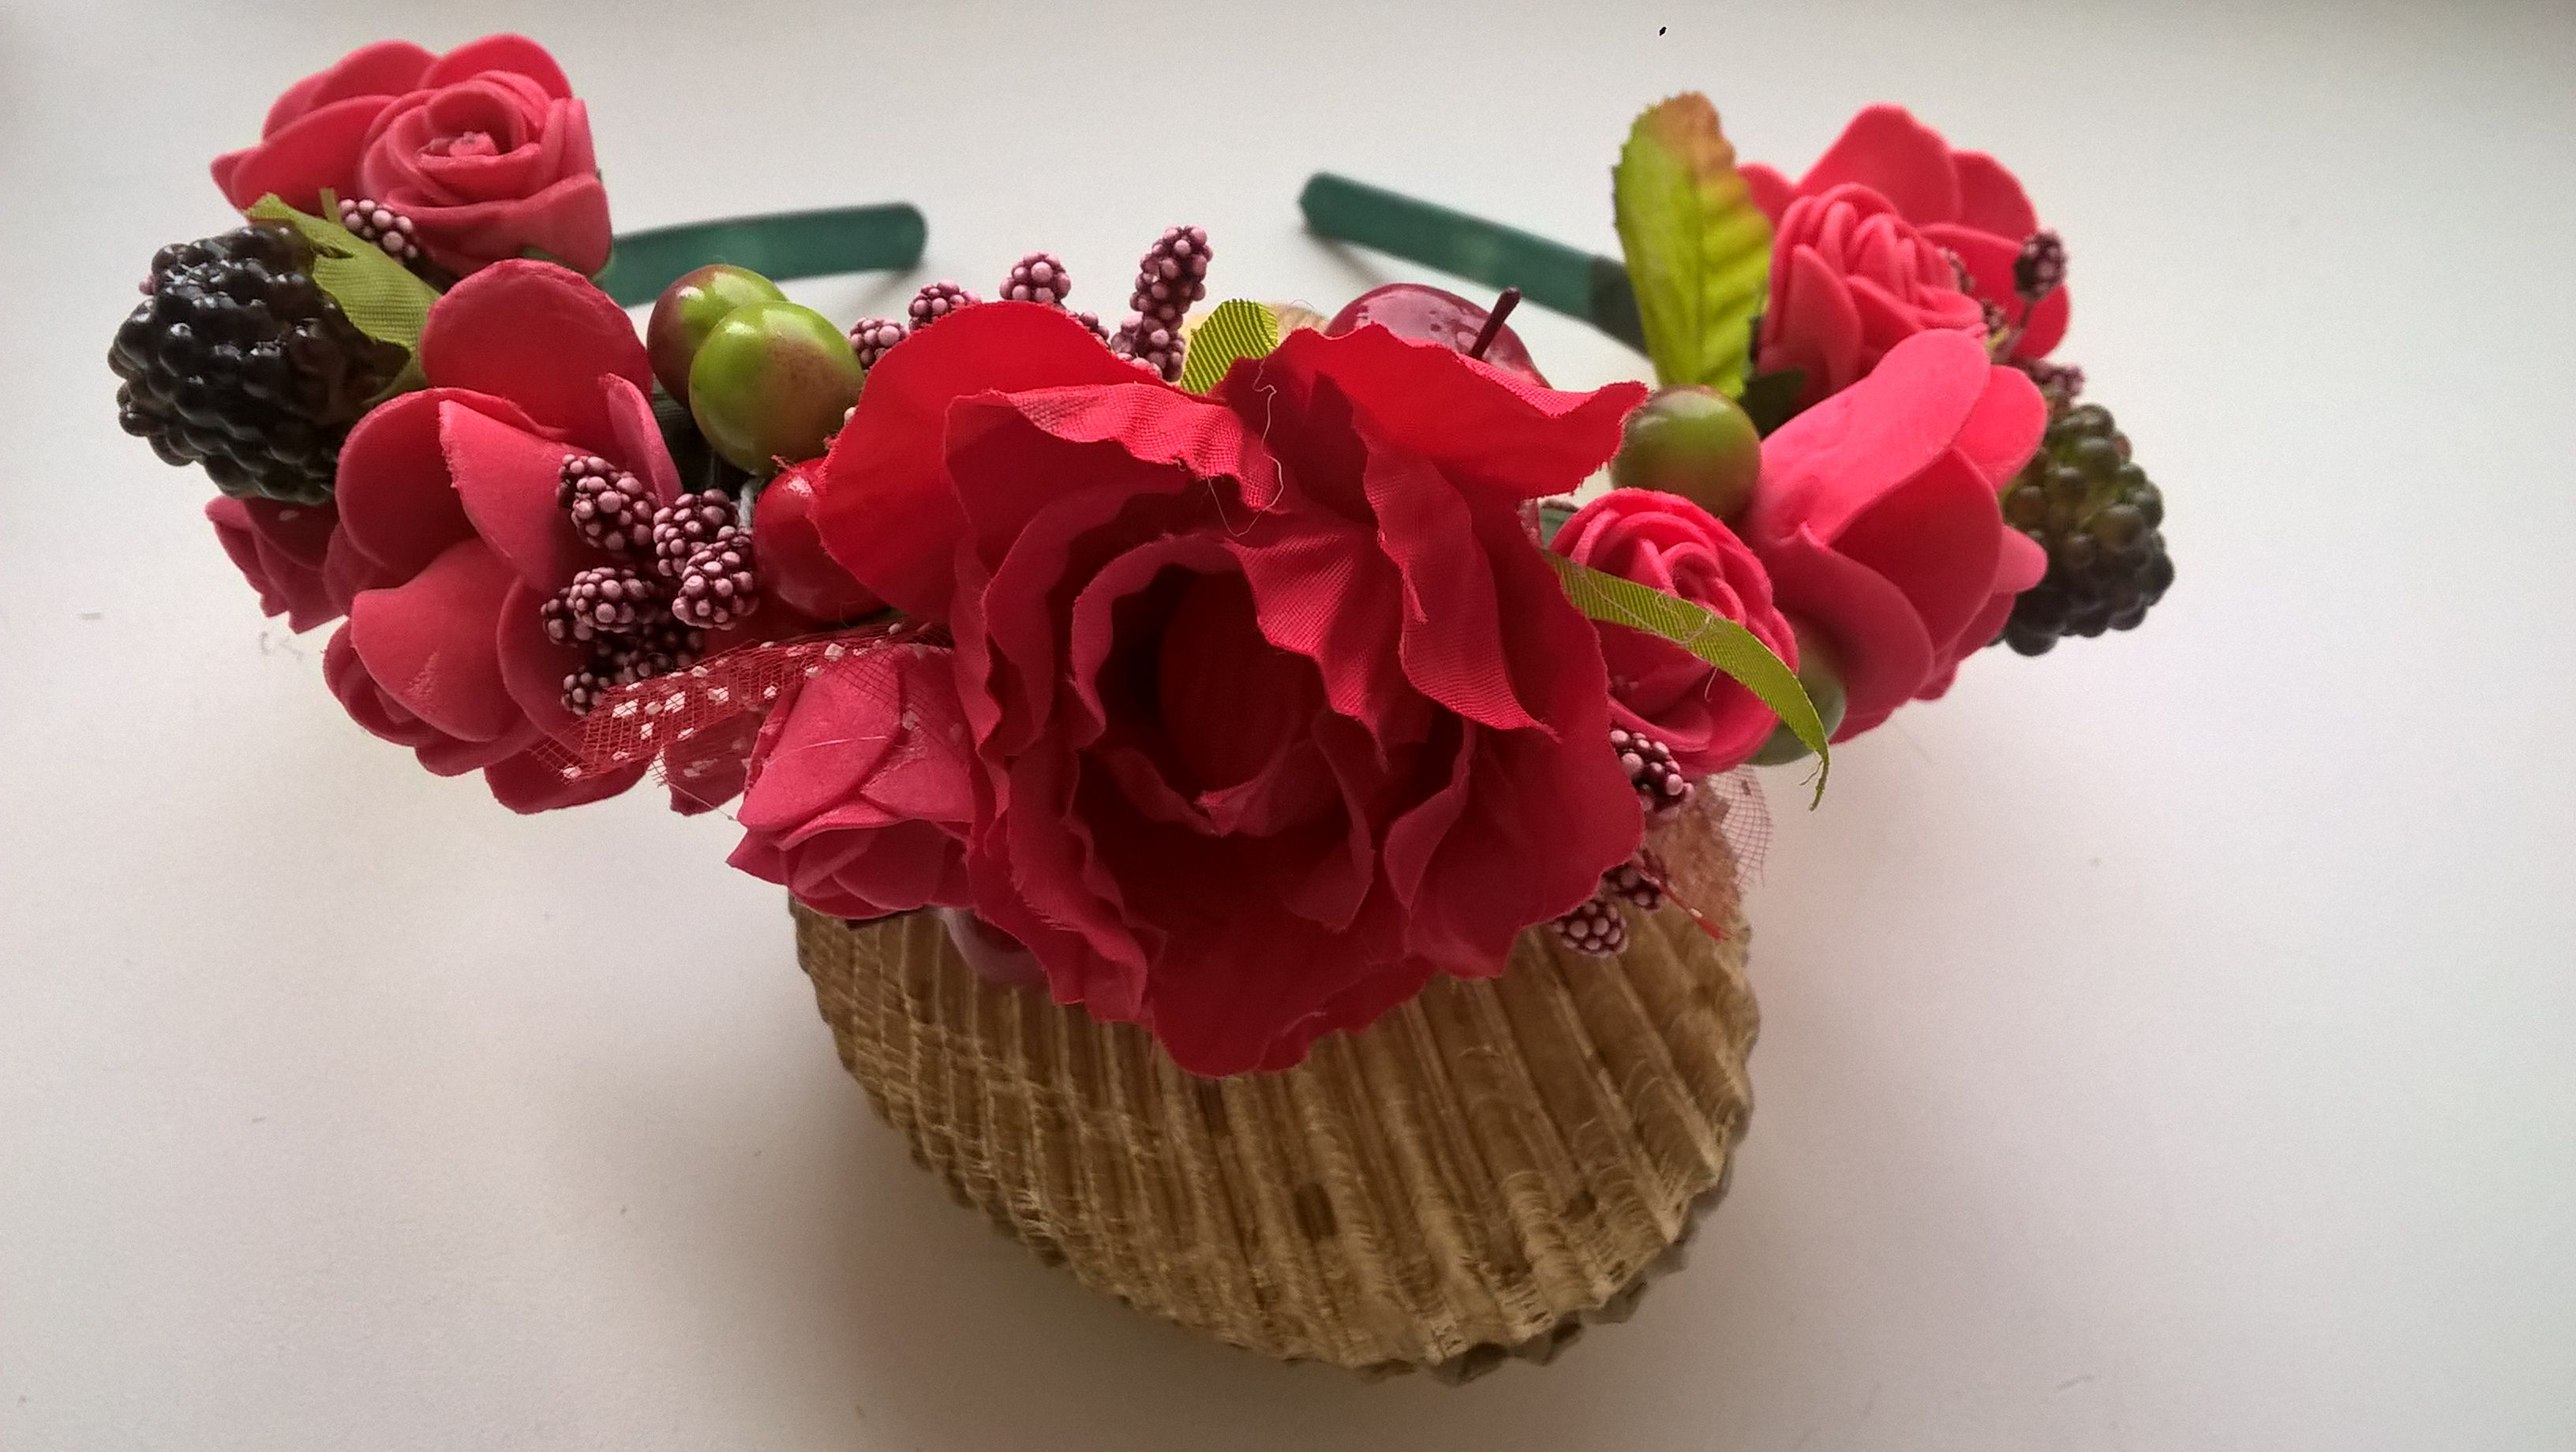 венок аксессуар дляволос ободок ягодки изцветов